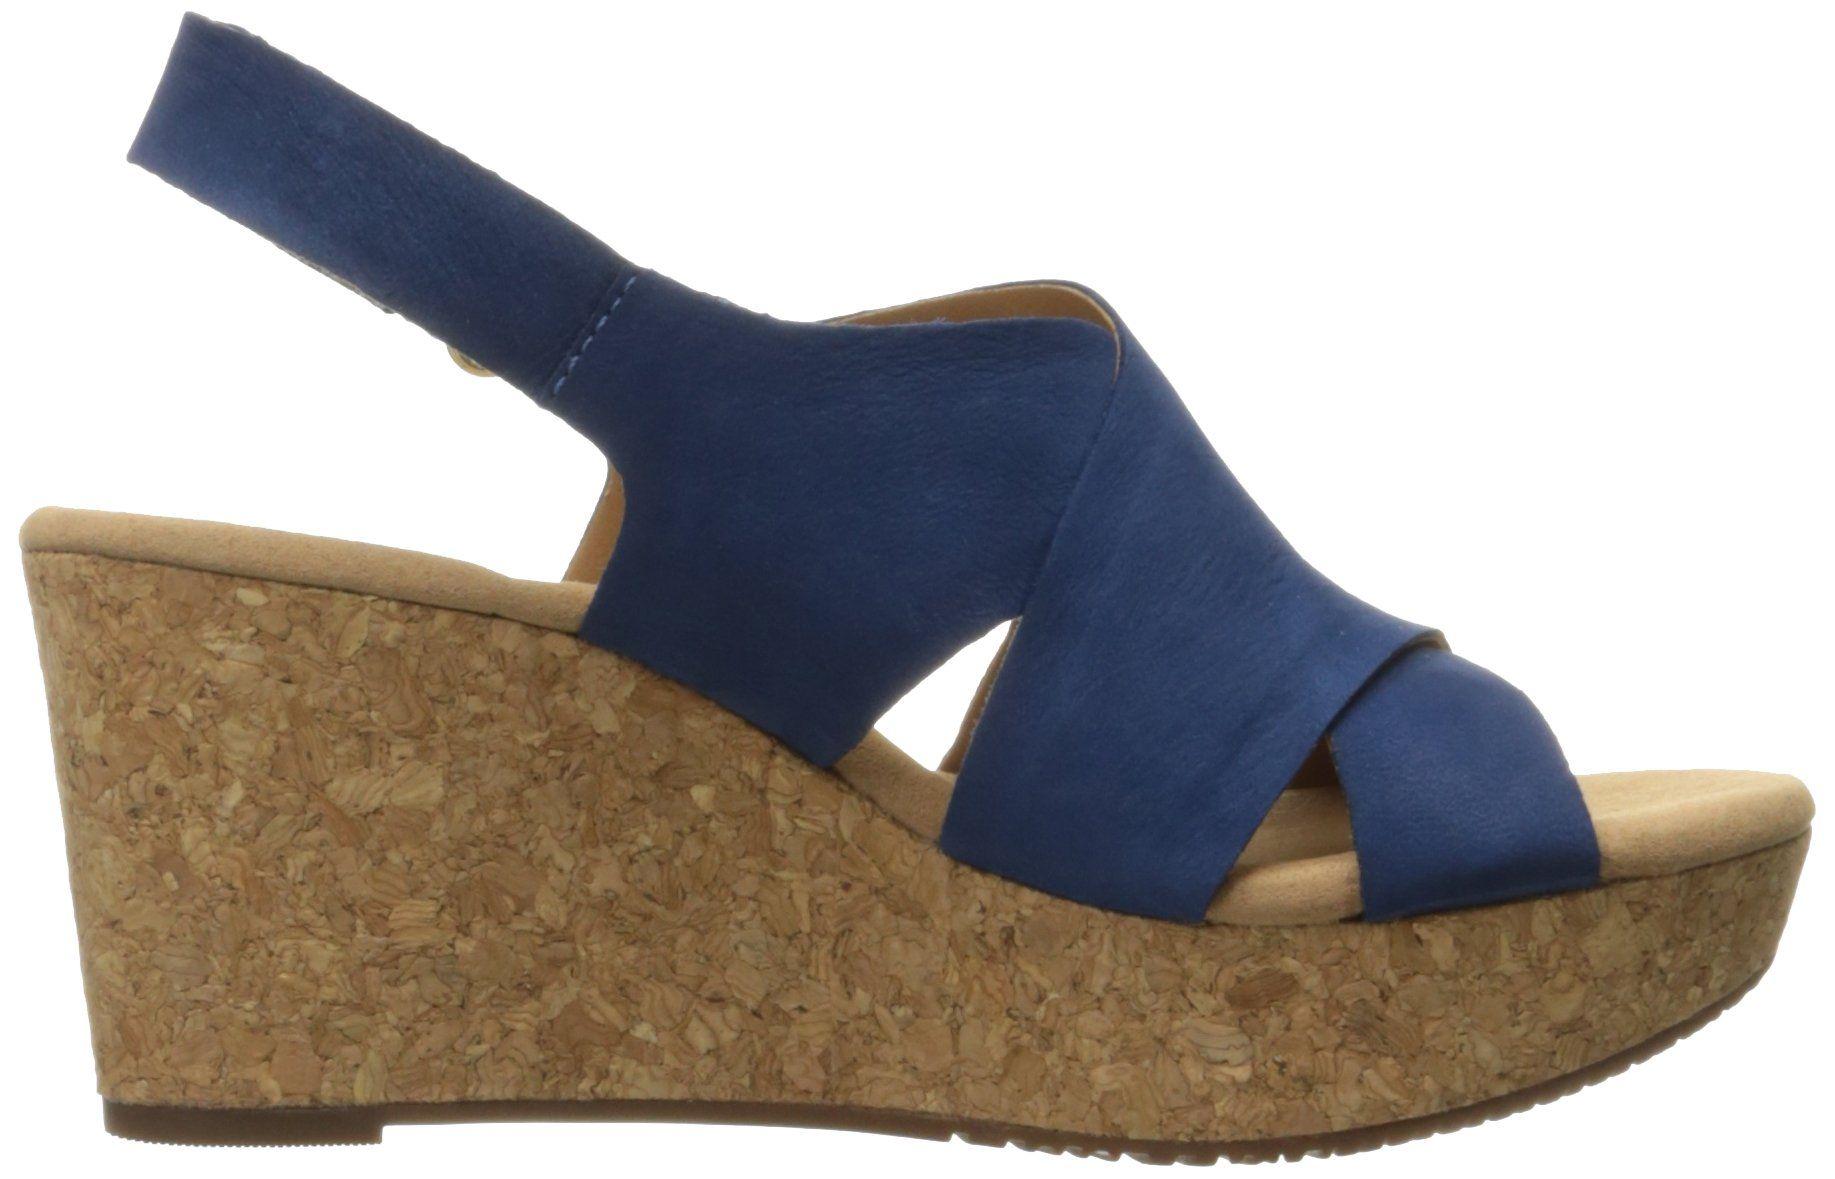 fd9771fe4d9f Clarks Womens Annadel Fareda Wedge Sandal Dark Blue Nubuck 10 M US   Click  on the